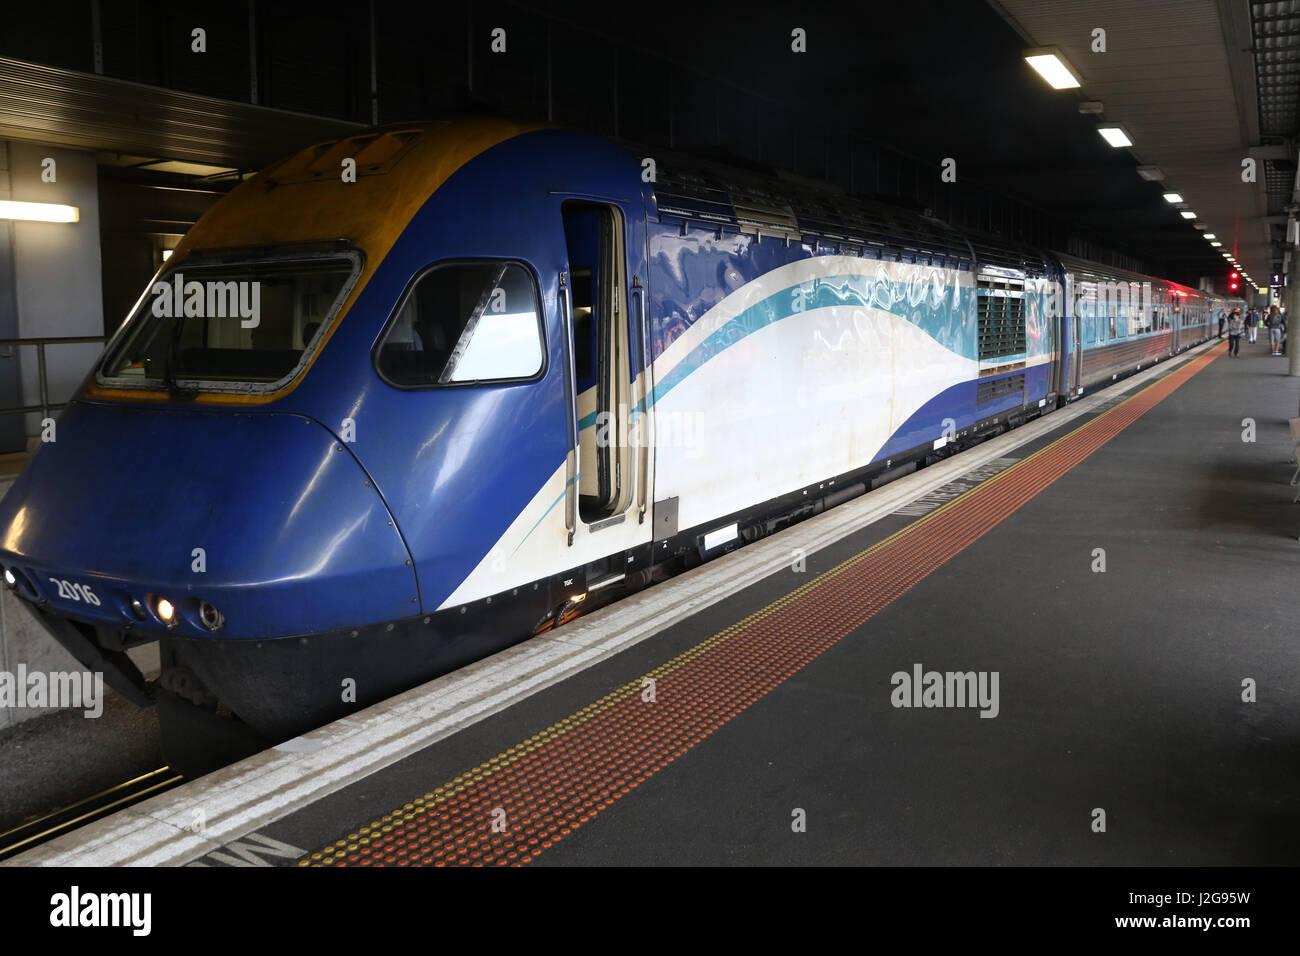 Sydney To Melbourne Train Stock Photos & Sydney To Melbourne